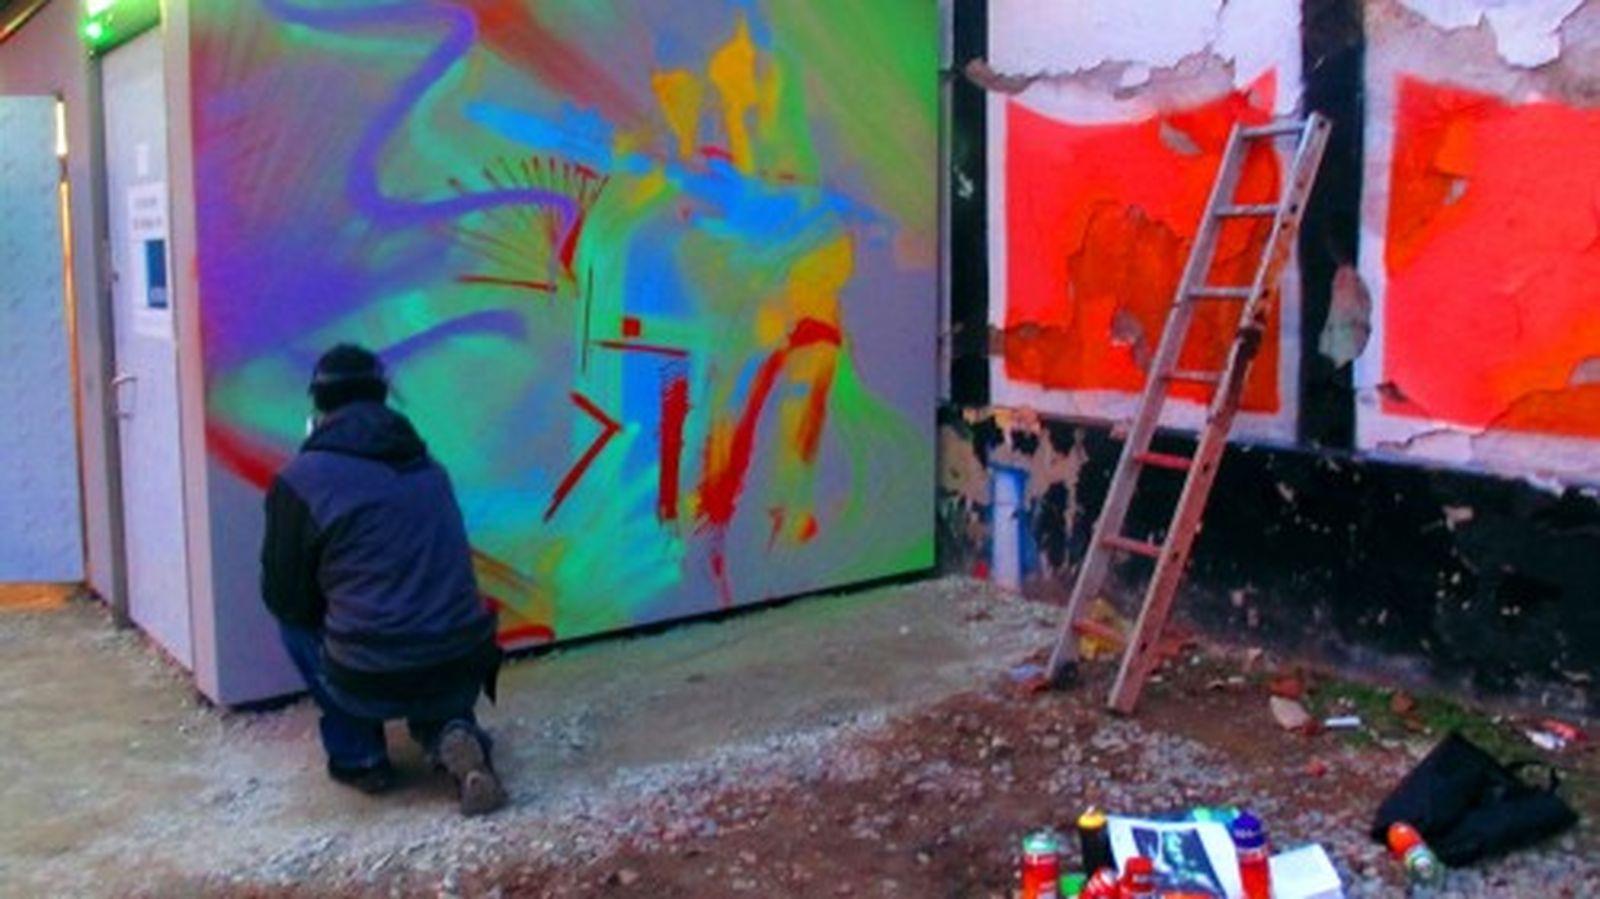 Ab morgen kann man Jimi Hendrix an der Fassade des neuen Örtchens bewundern.